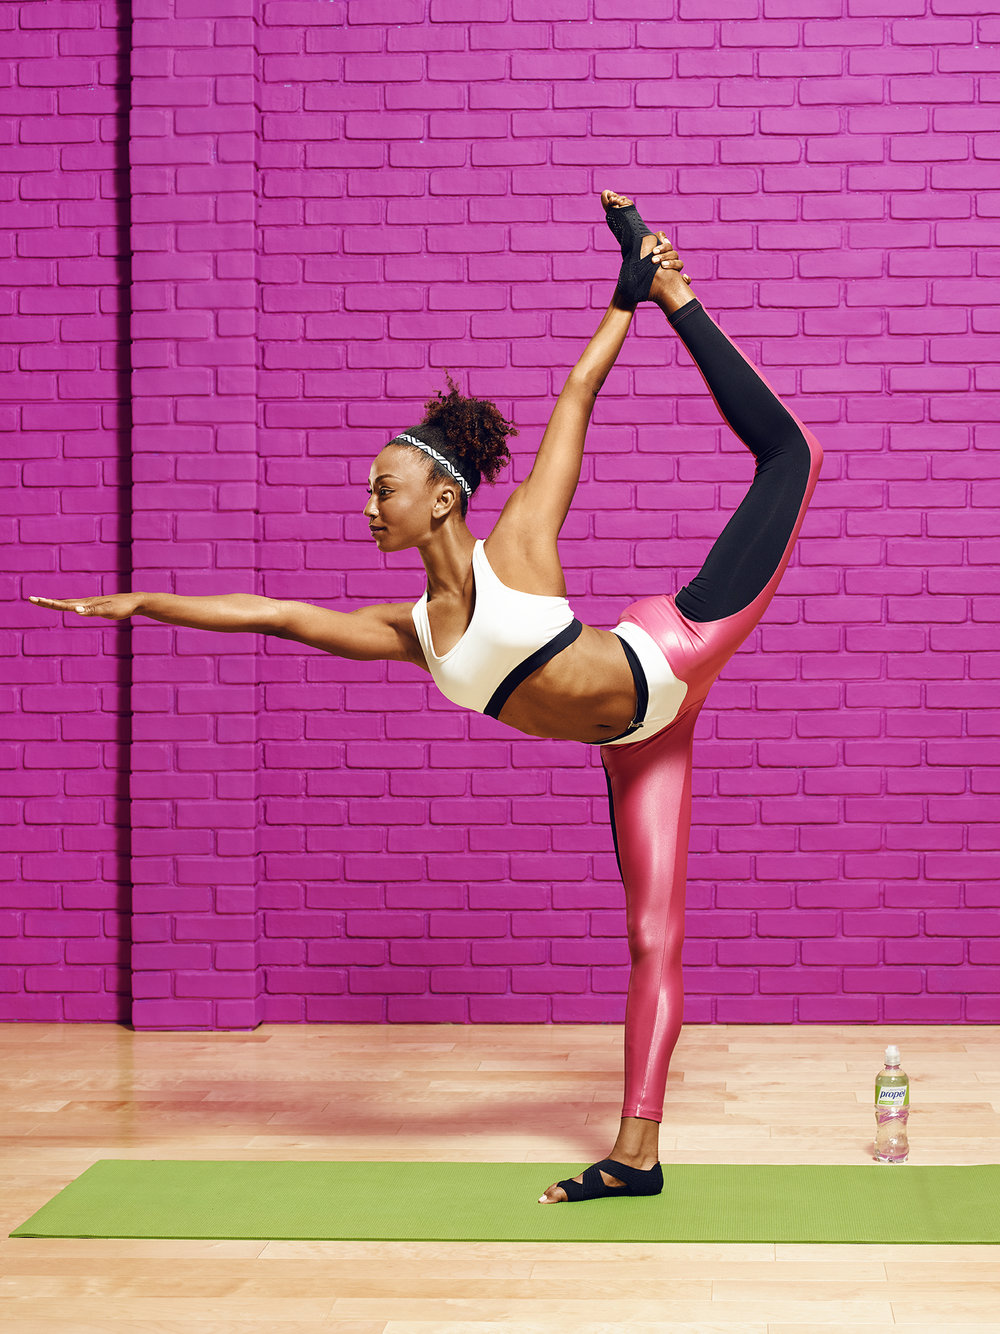 Yoga-4990-v4_72dpi_RGB.jpg